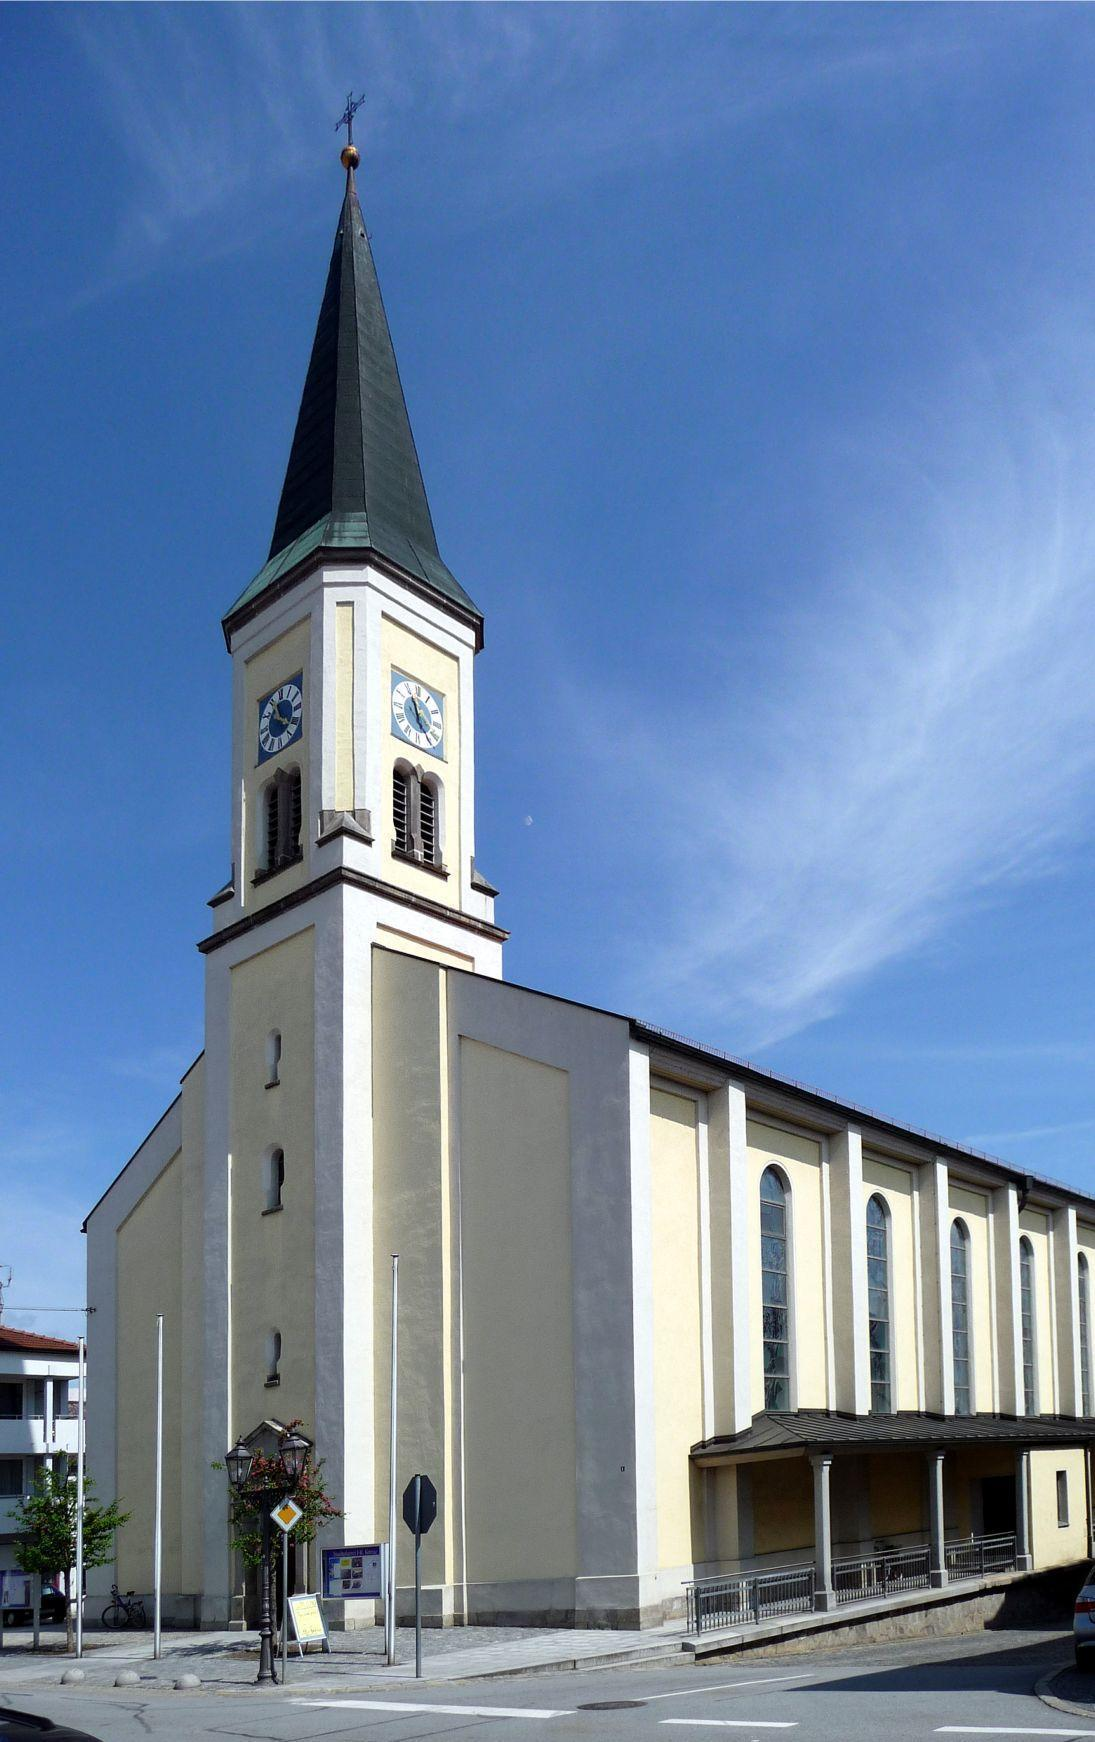 Pfarrkirche Osterhofen 2 200304 150653